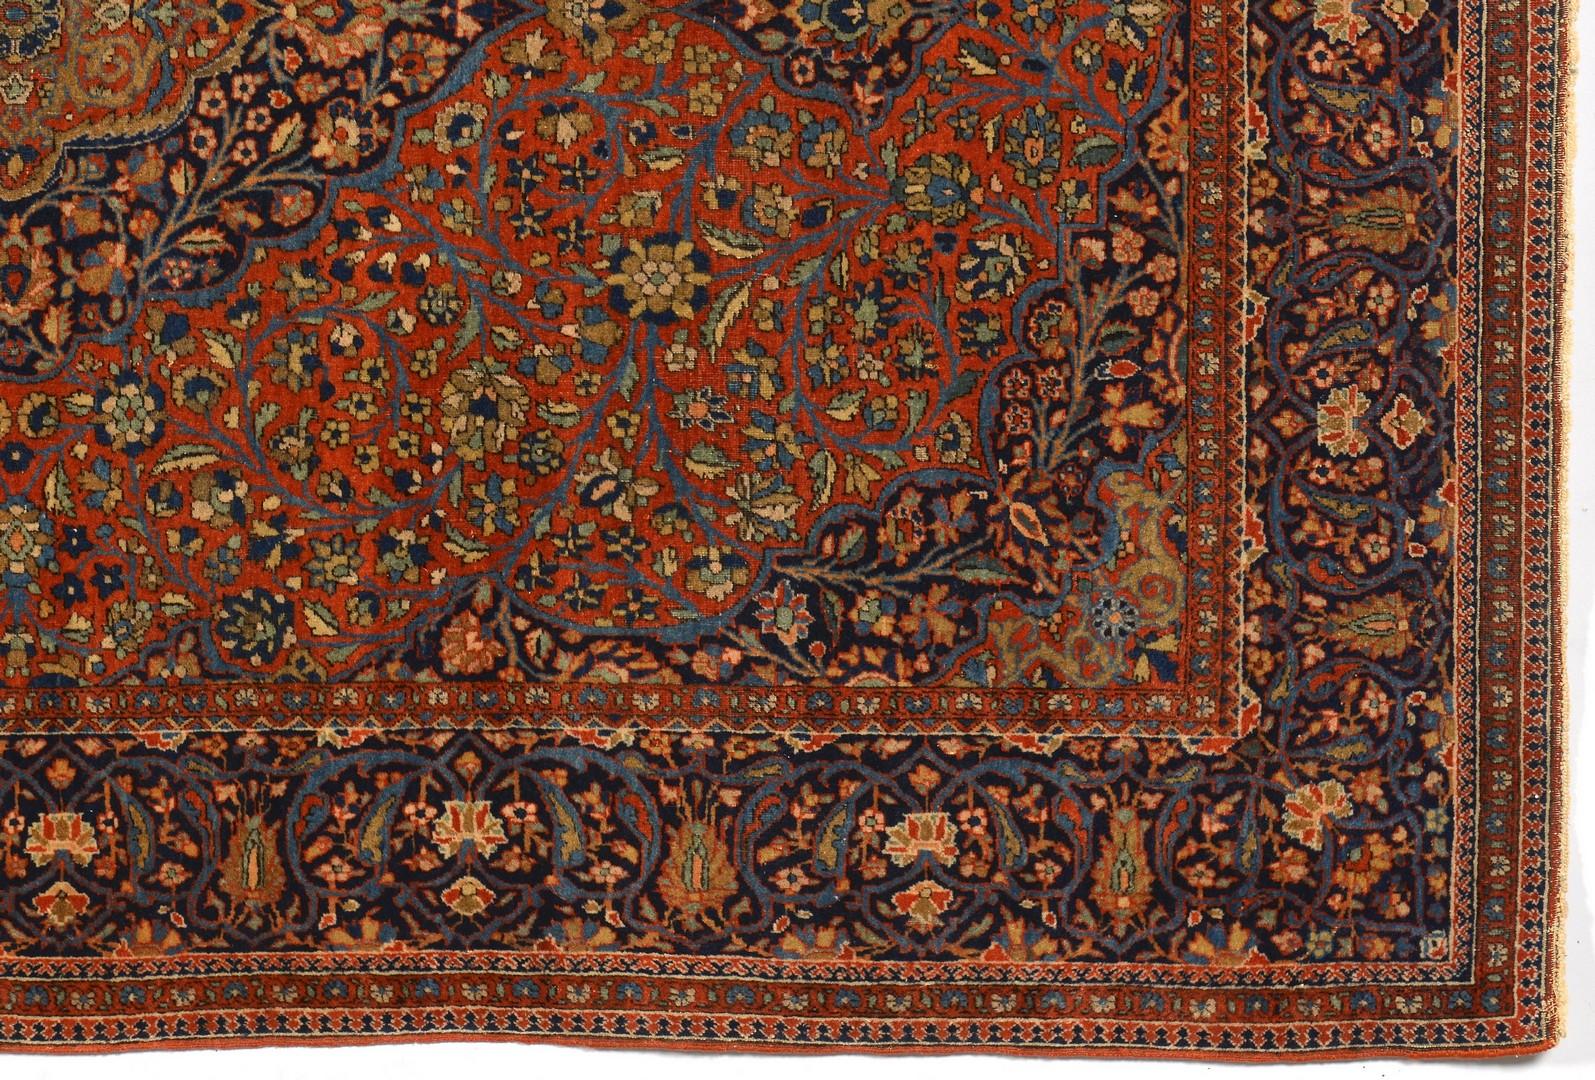 Lot 249: Antique Persian Kashan area rug